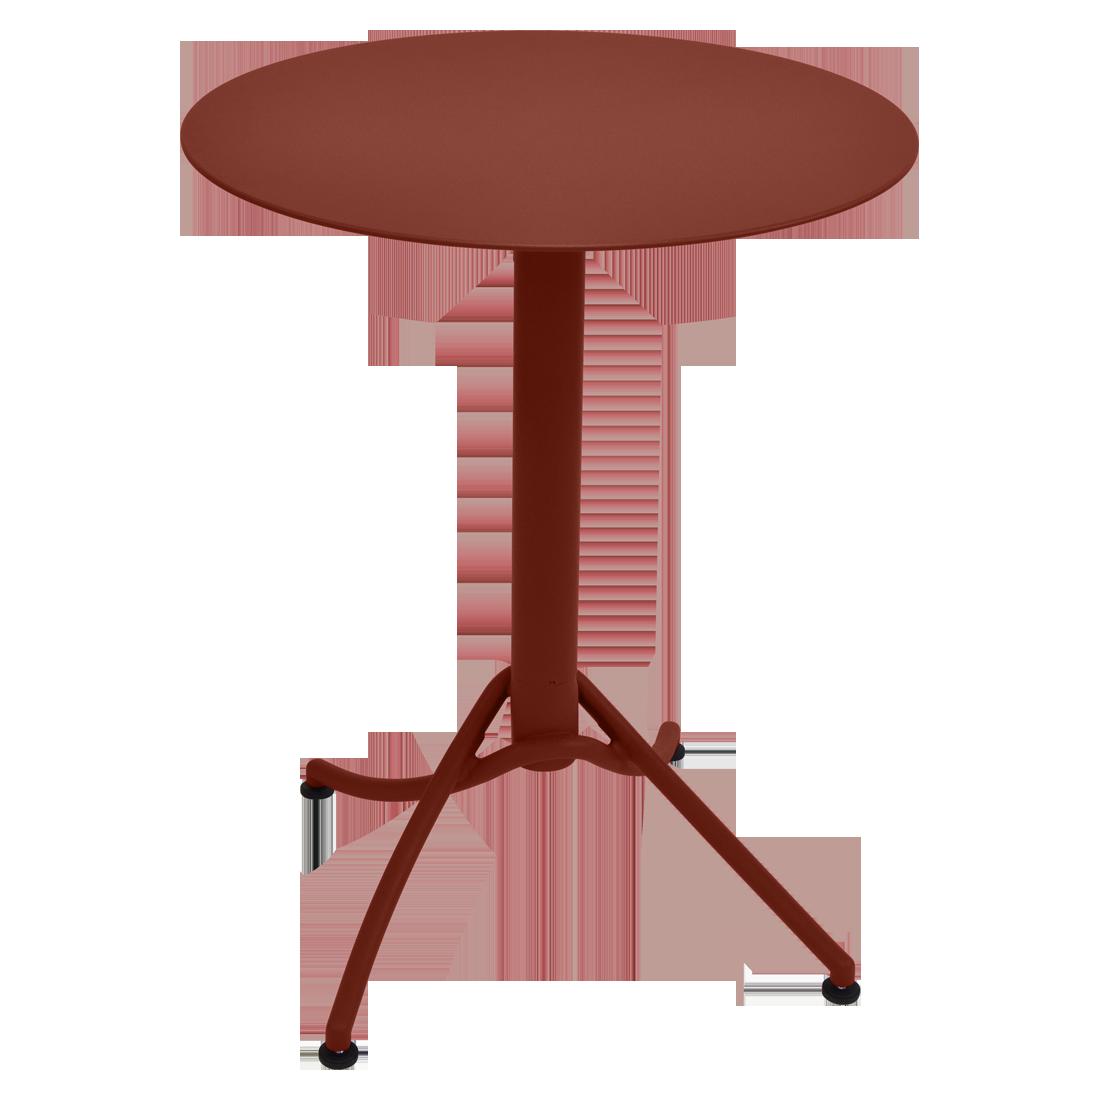 Table Ø 60 cm monochrome ariane ocre rouge